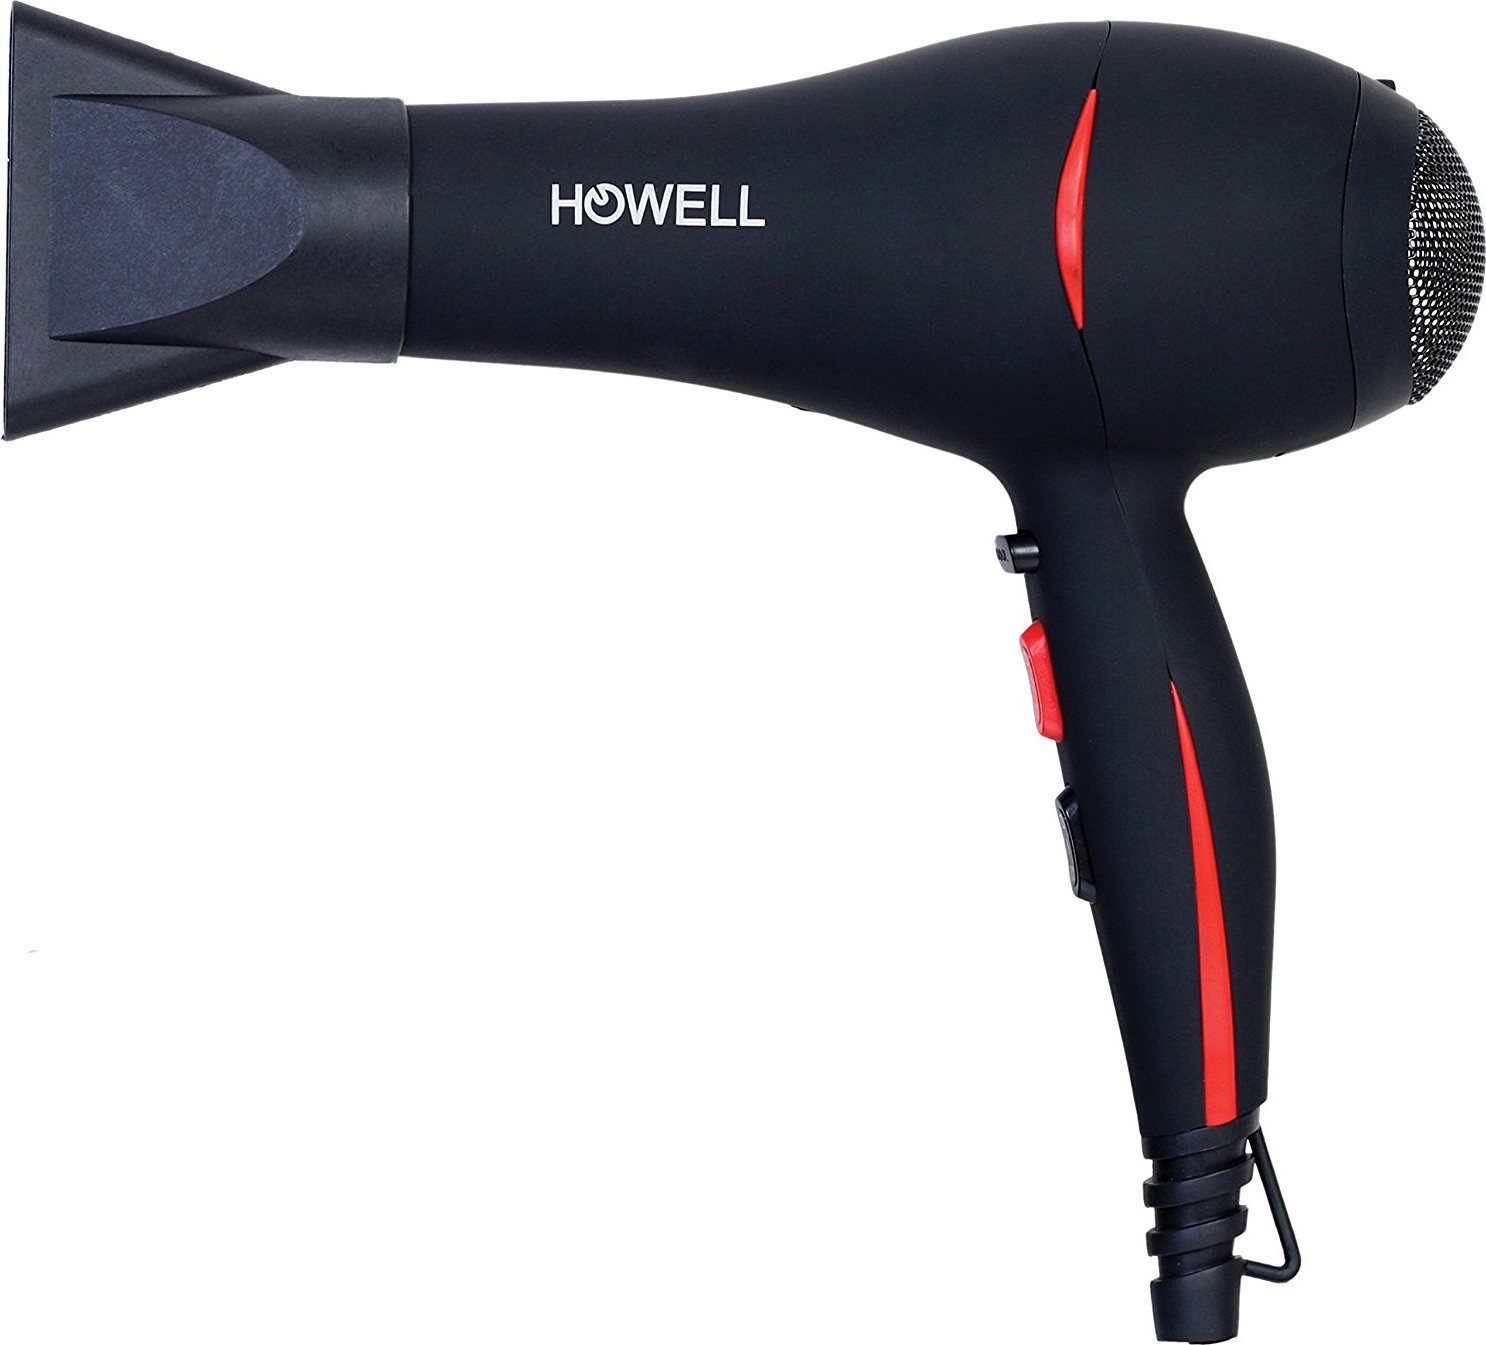 HOWELL Phon Asciugacapelli Asciuga Capelli Professionale 2000 W Hp2026Pro